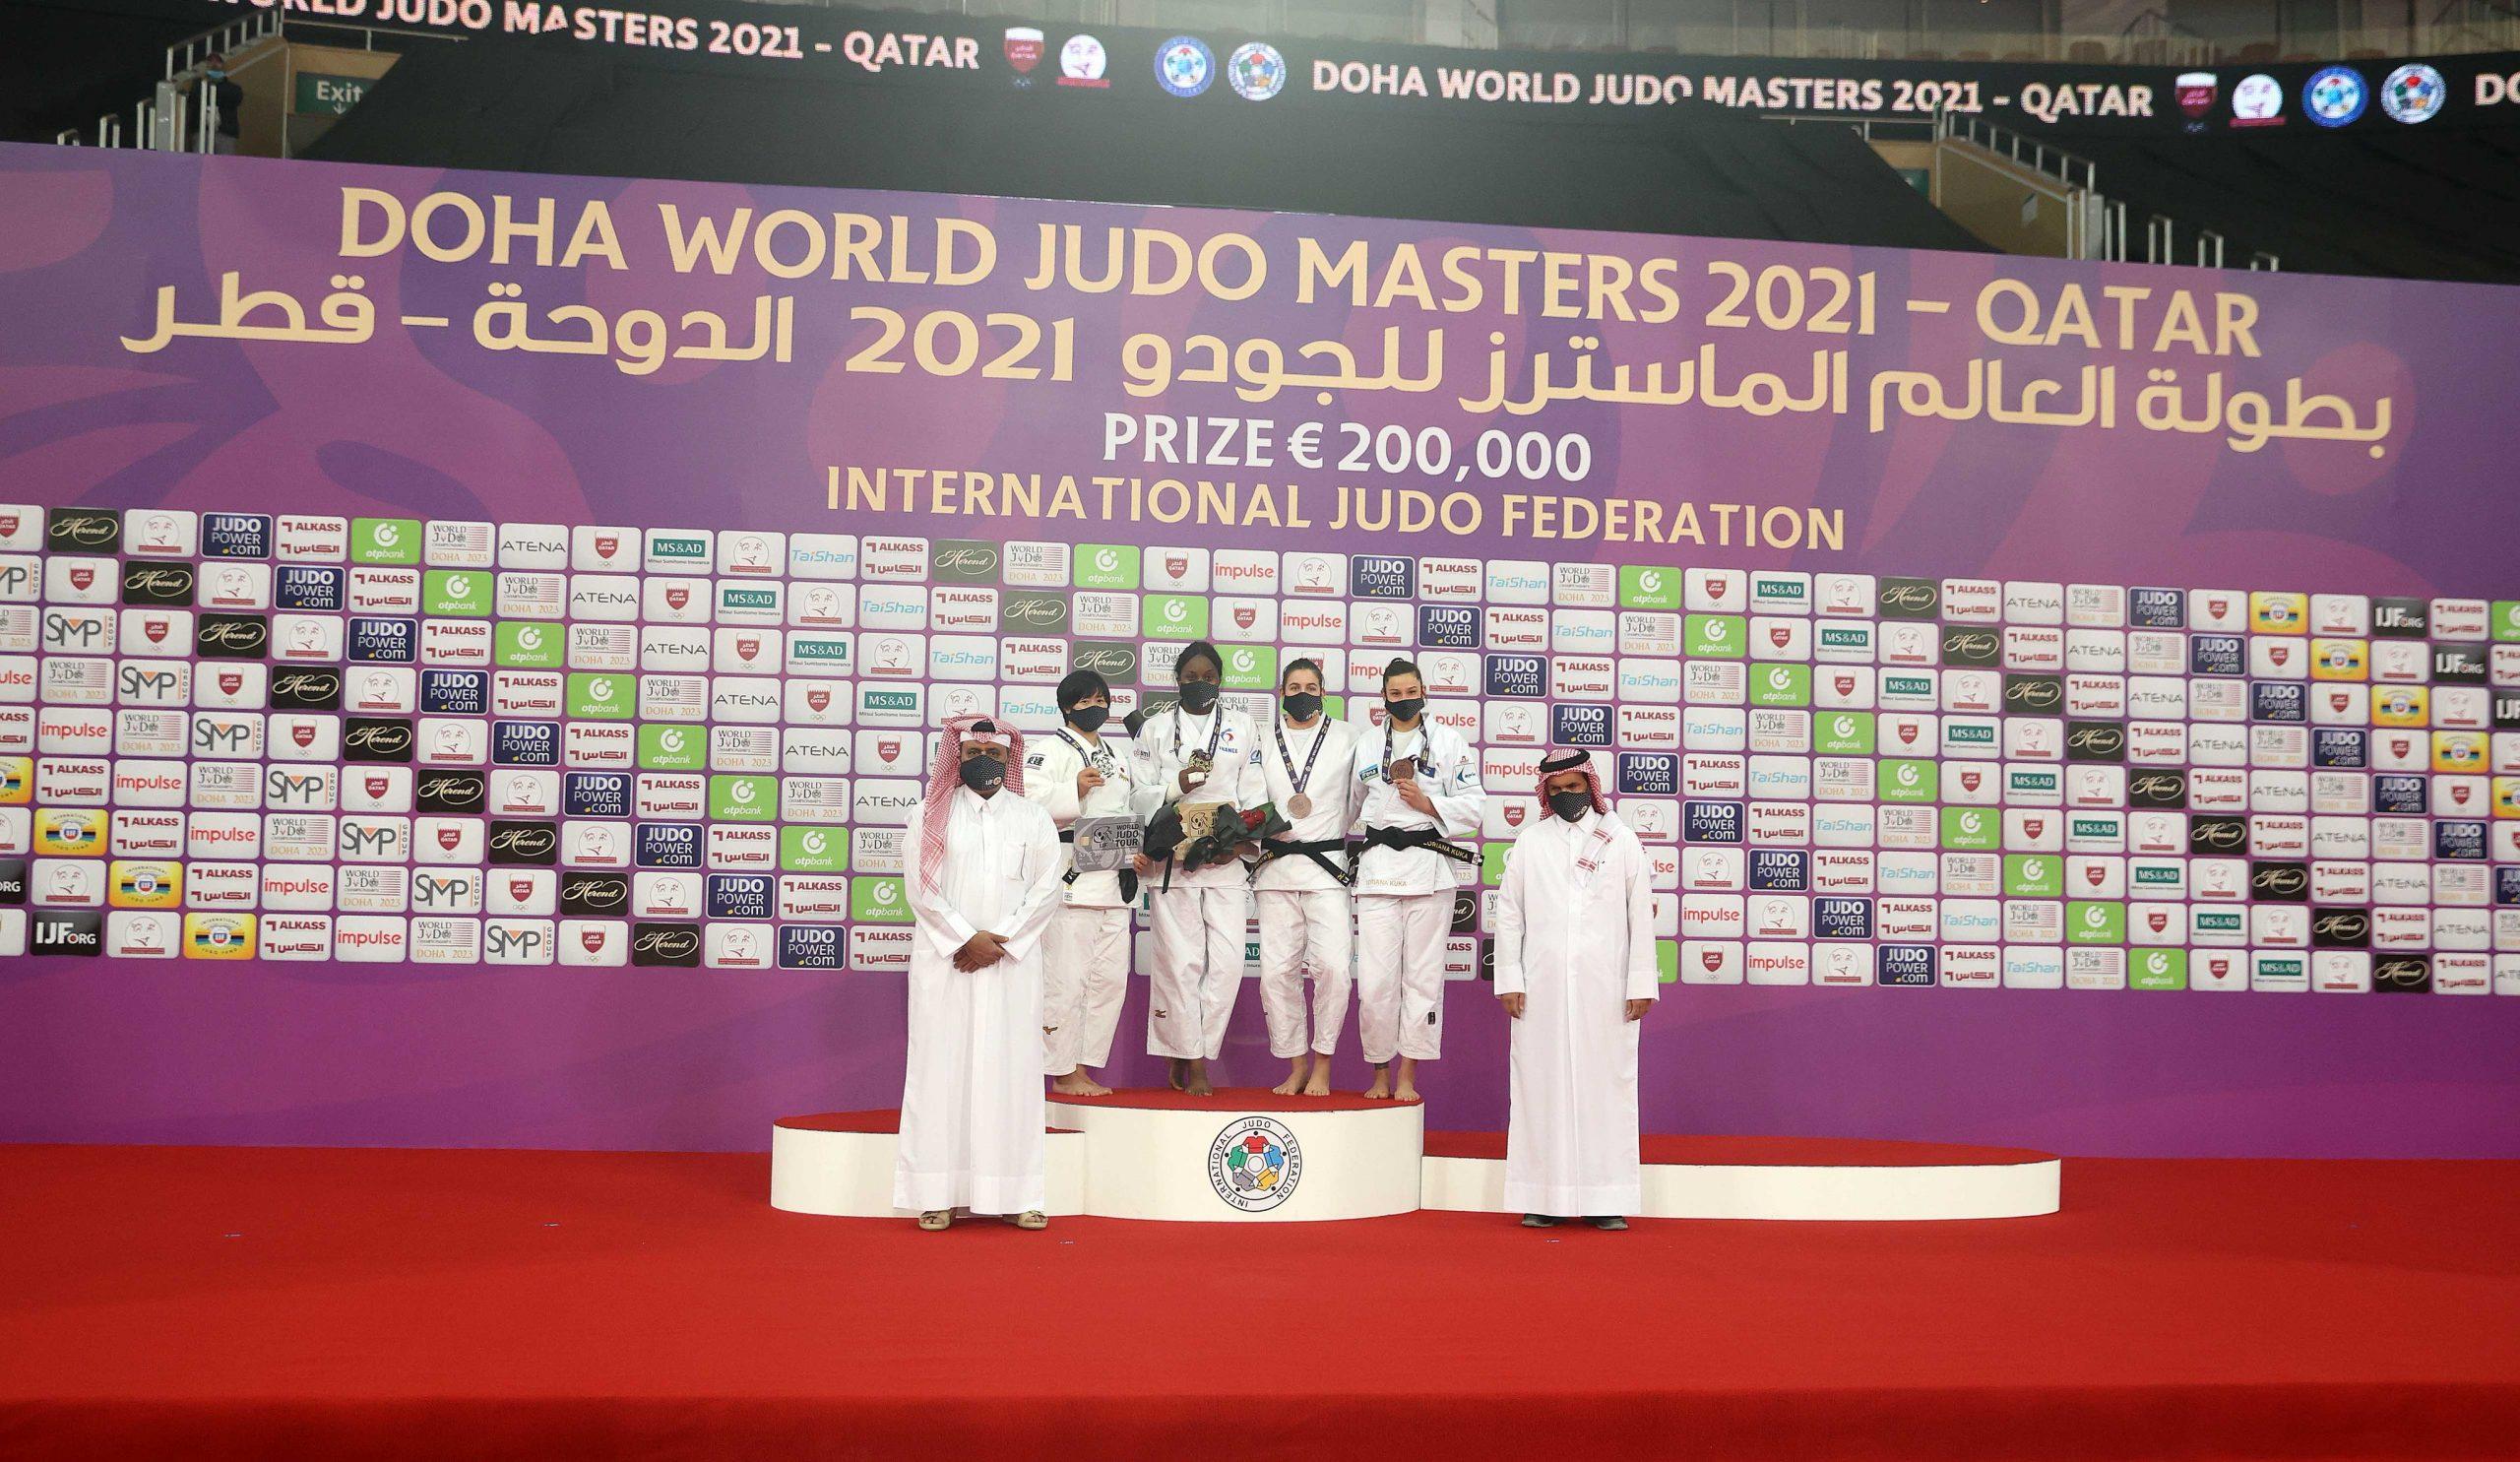 Sheikh Joaan Crowns Winner of Doha World Judo Masters 2021